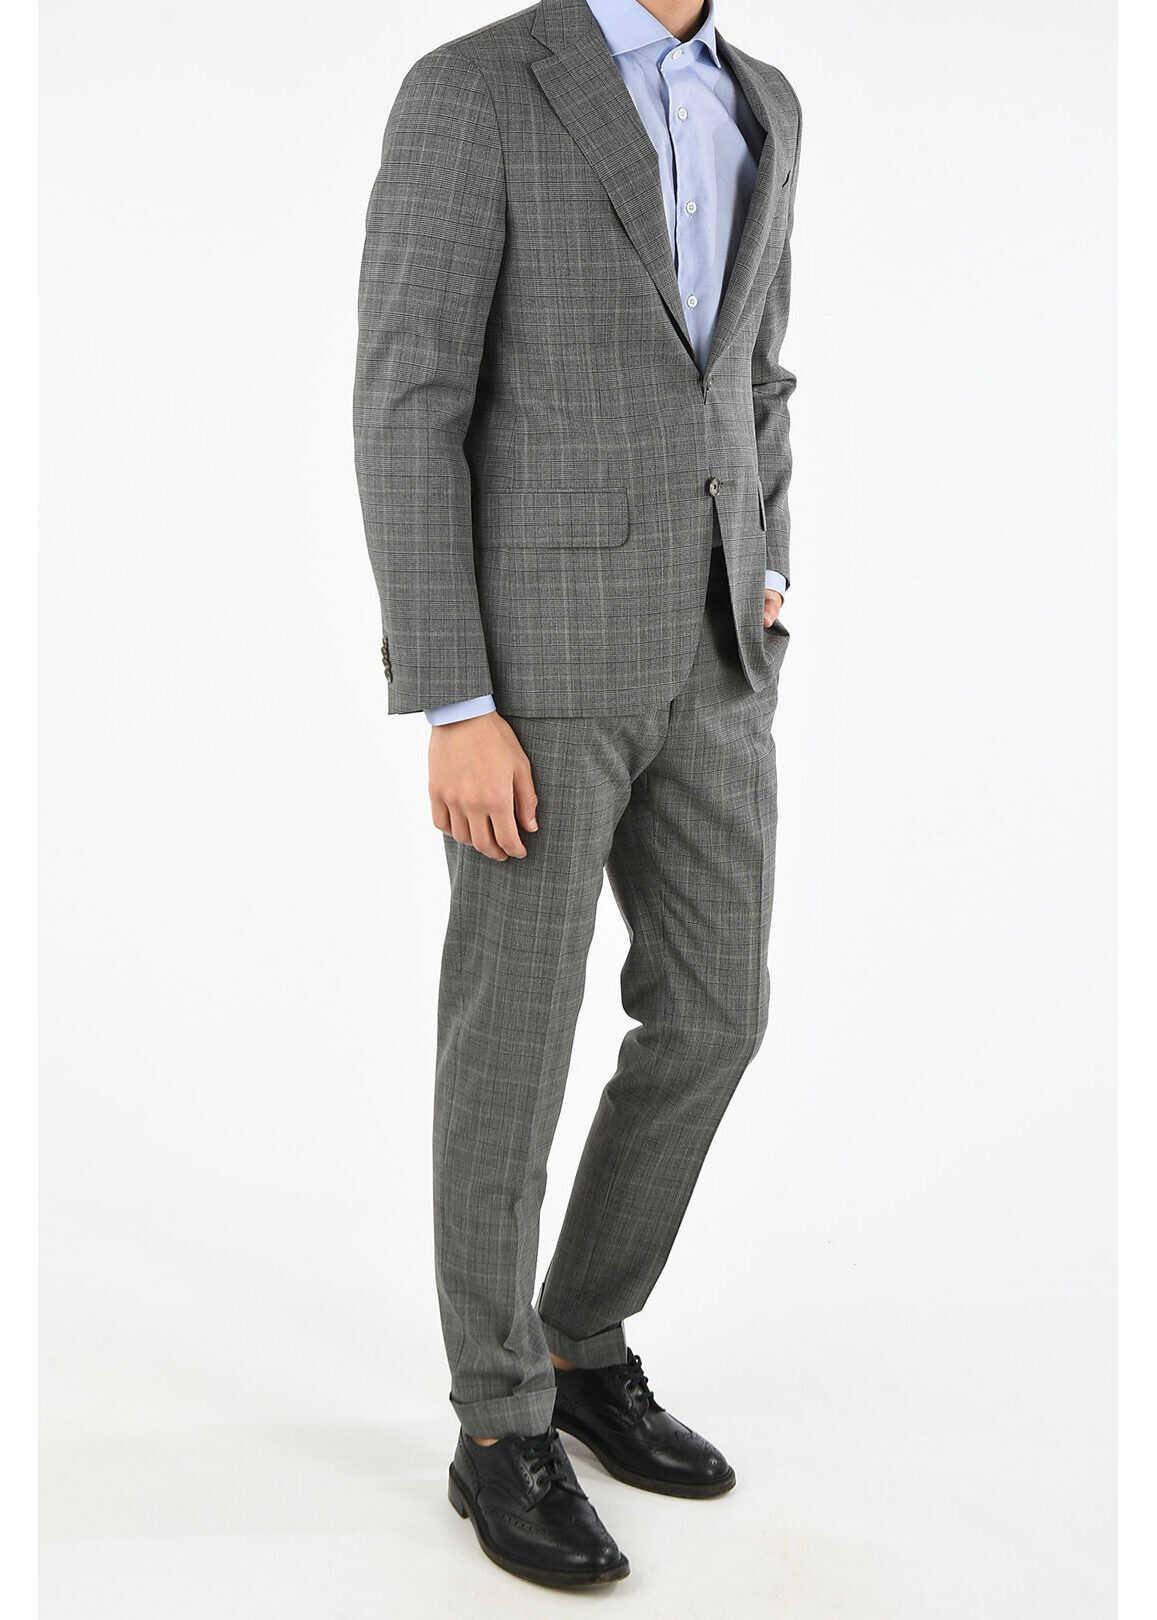 CORNELIANI CC COLLECTION virgin wool RETAILORED suit GRAY imagine